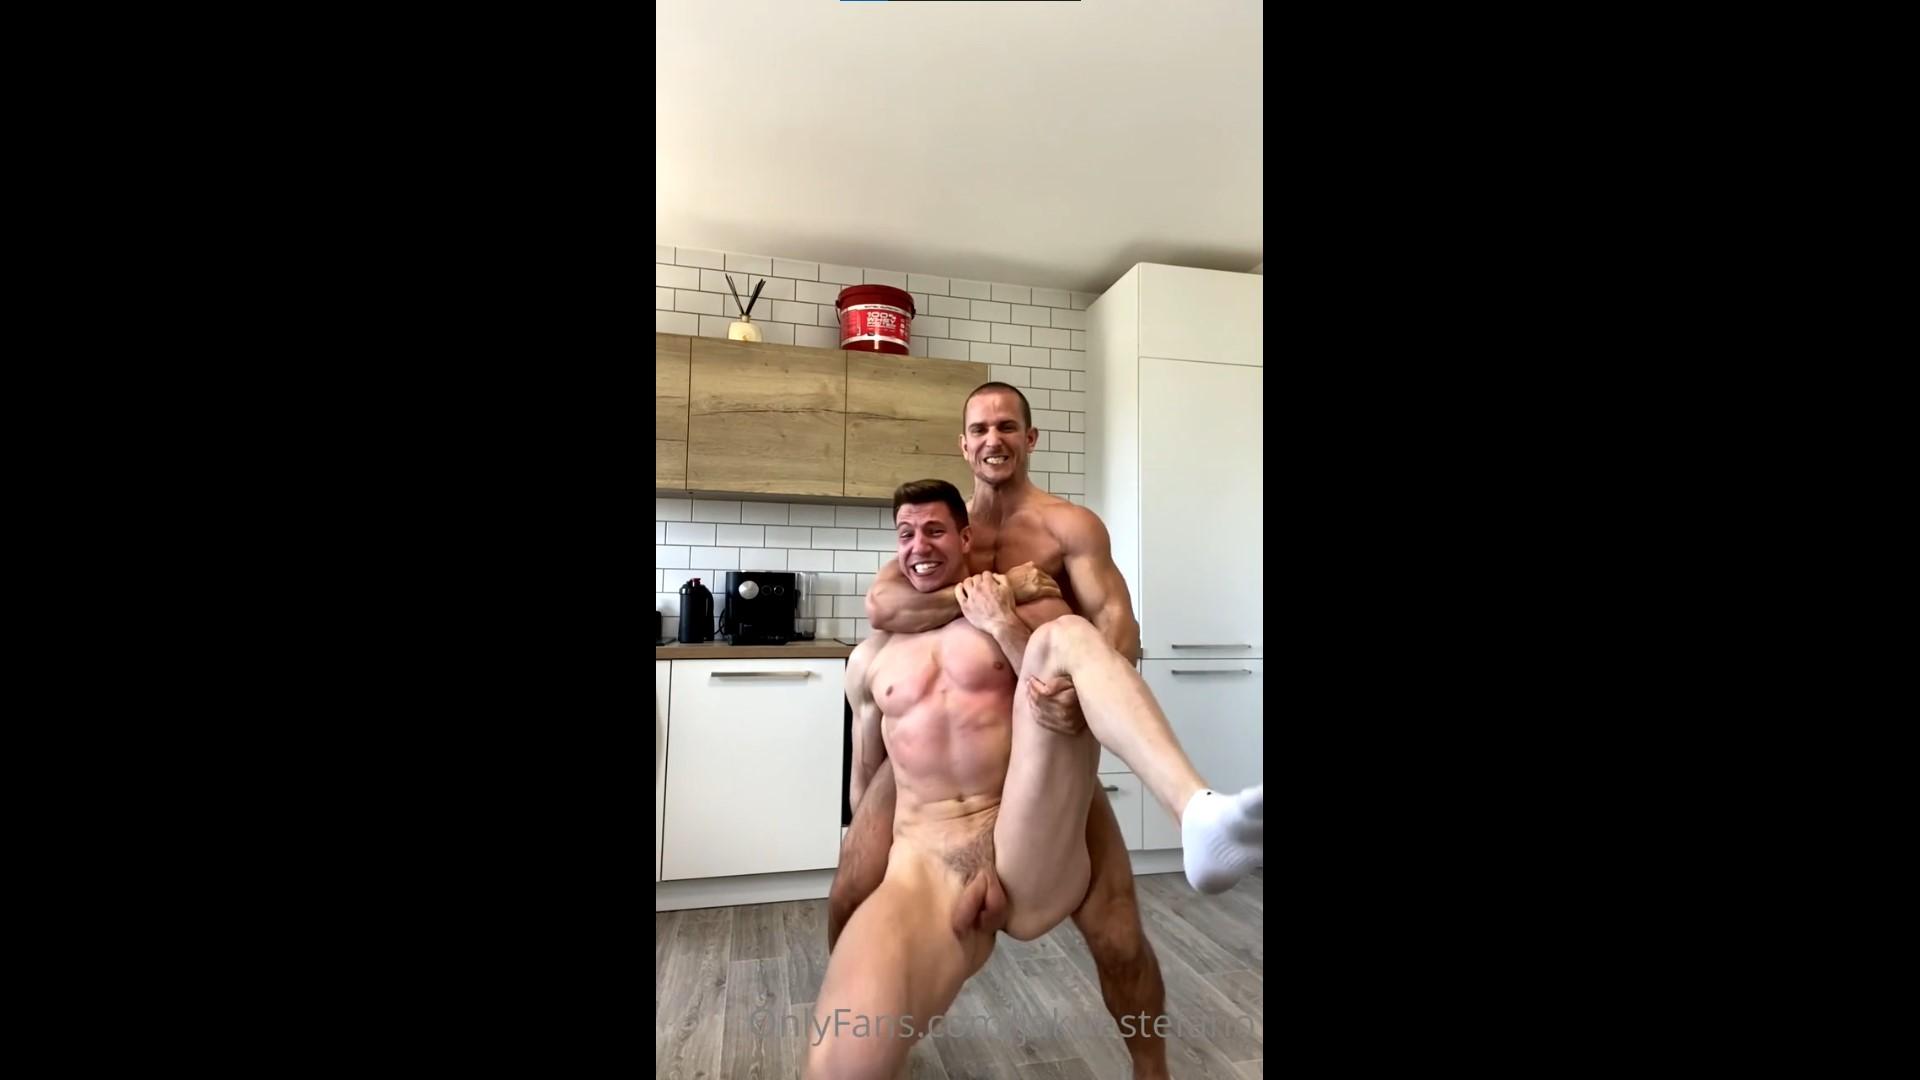 Jakub Stefano and Niko Vangelis wrestle nude – Gay for Fans – gayforfans.com